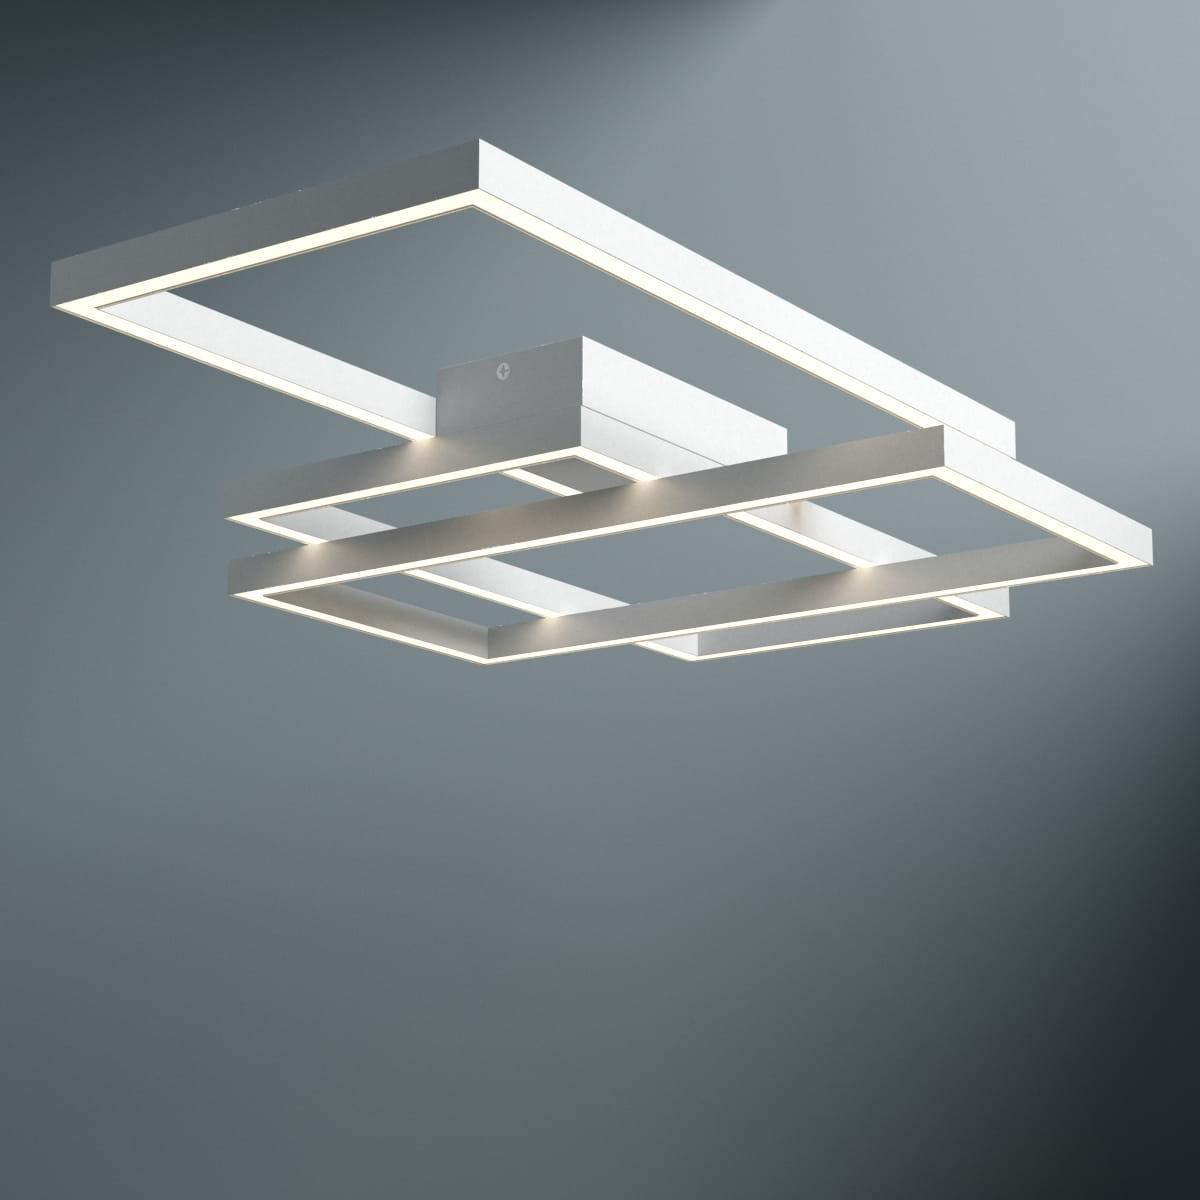 lamp 27 AM247